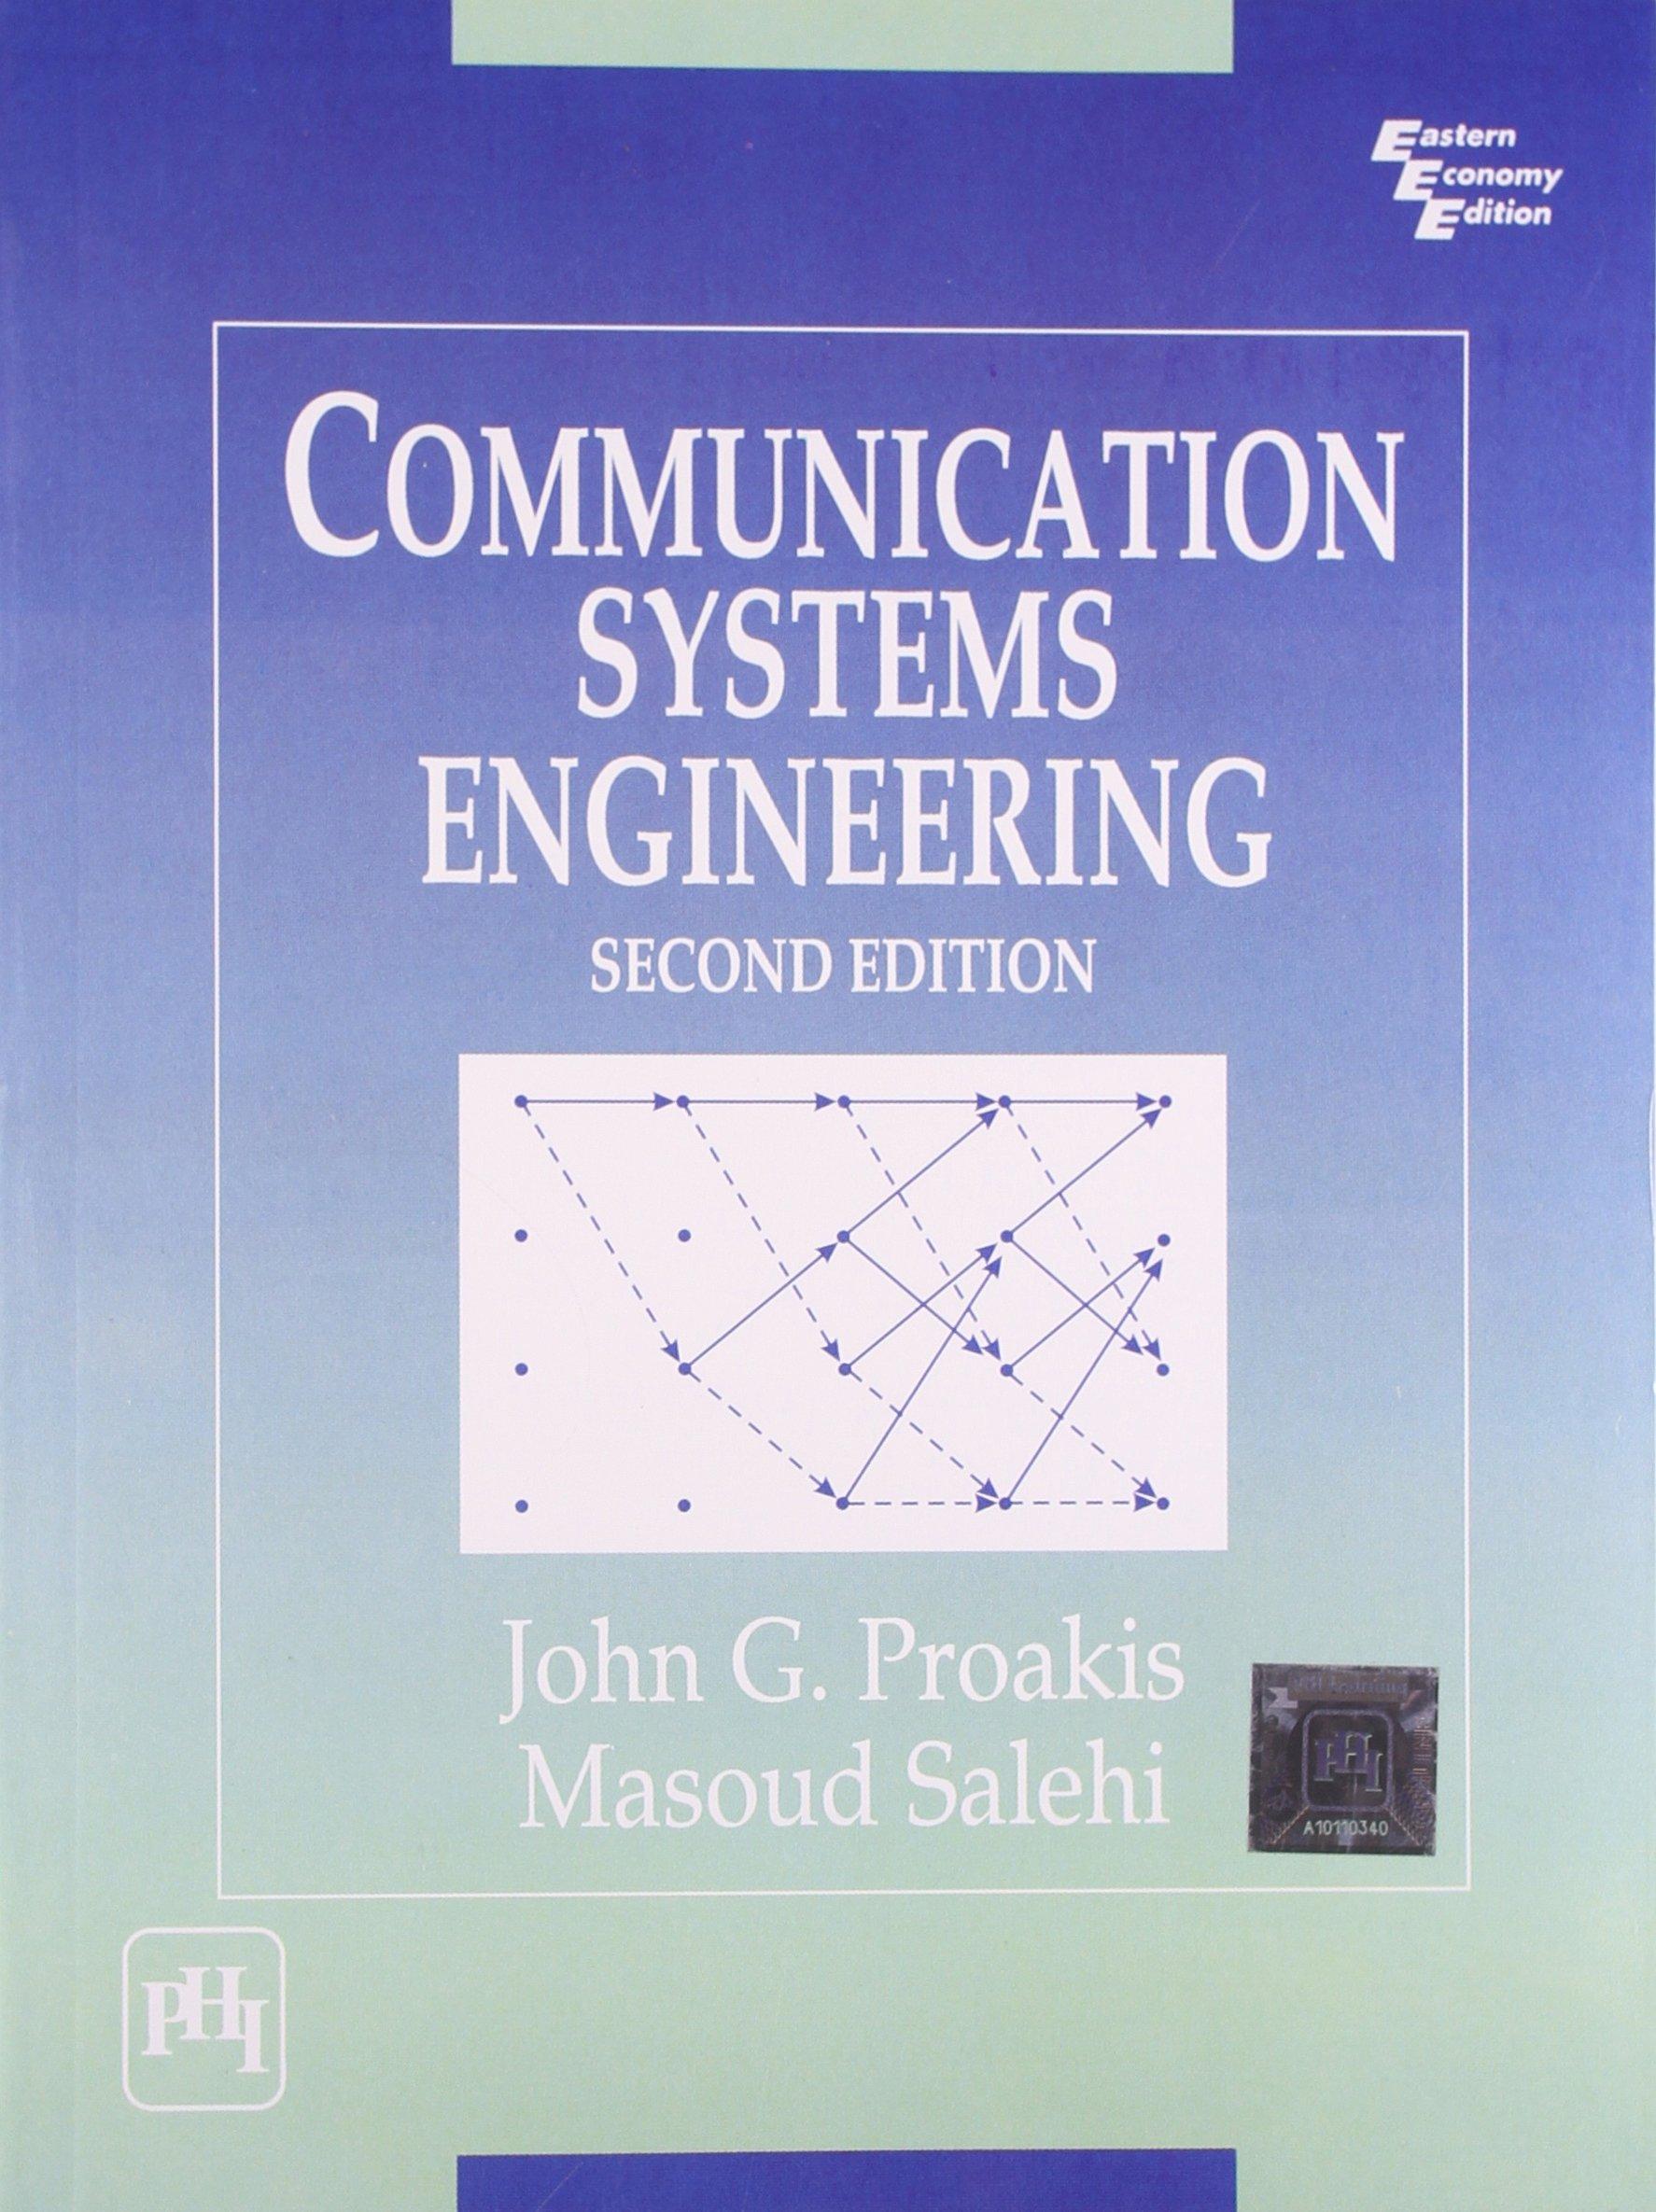 Communication systems engineering: masoud salehi john g. Proakis.